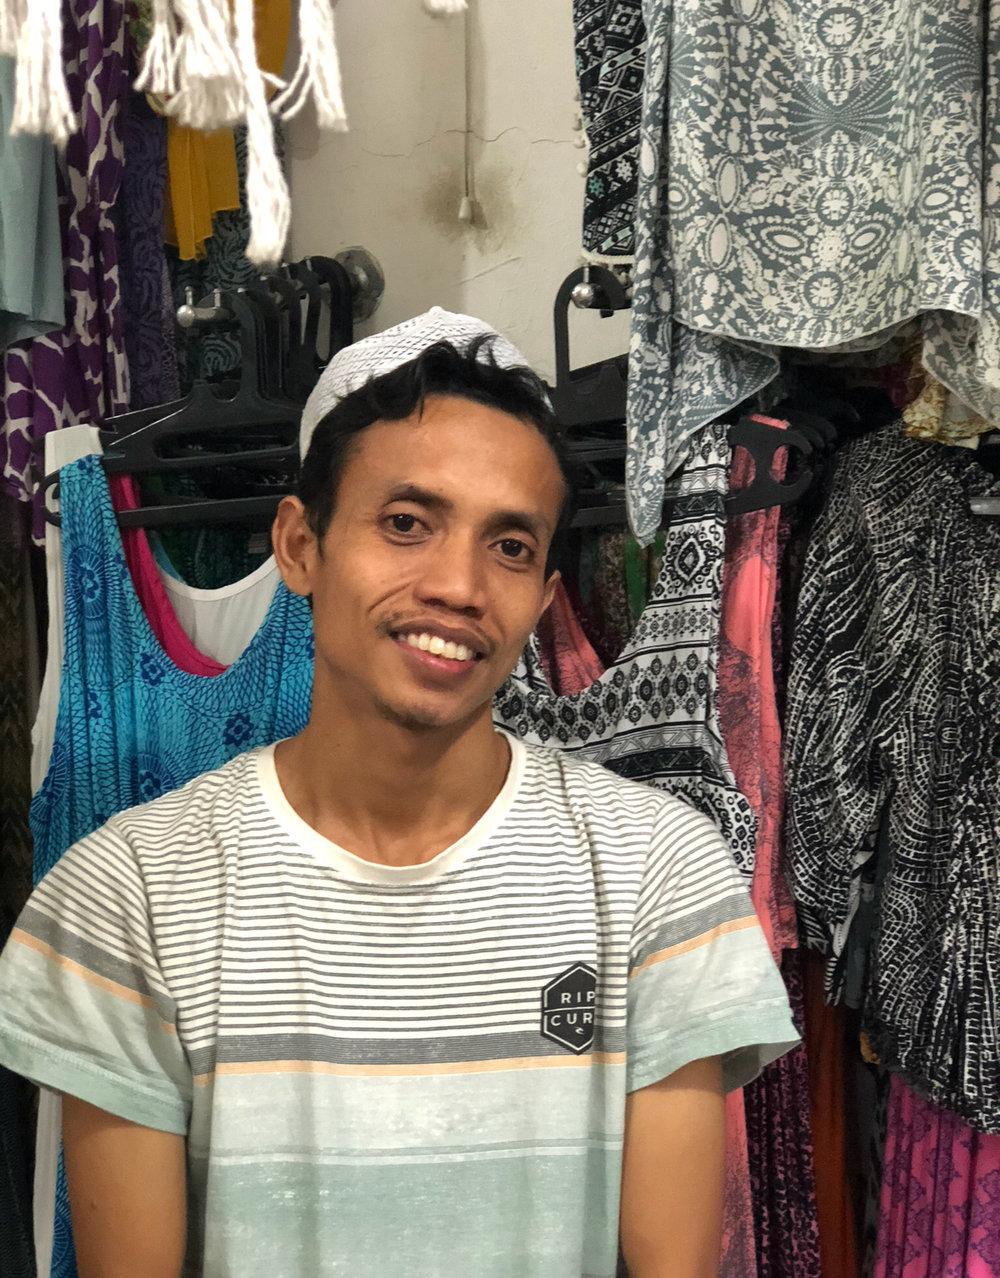 Balinese Local Merchant